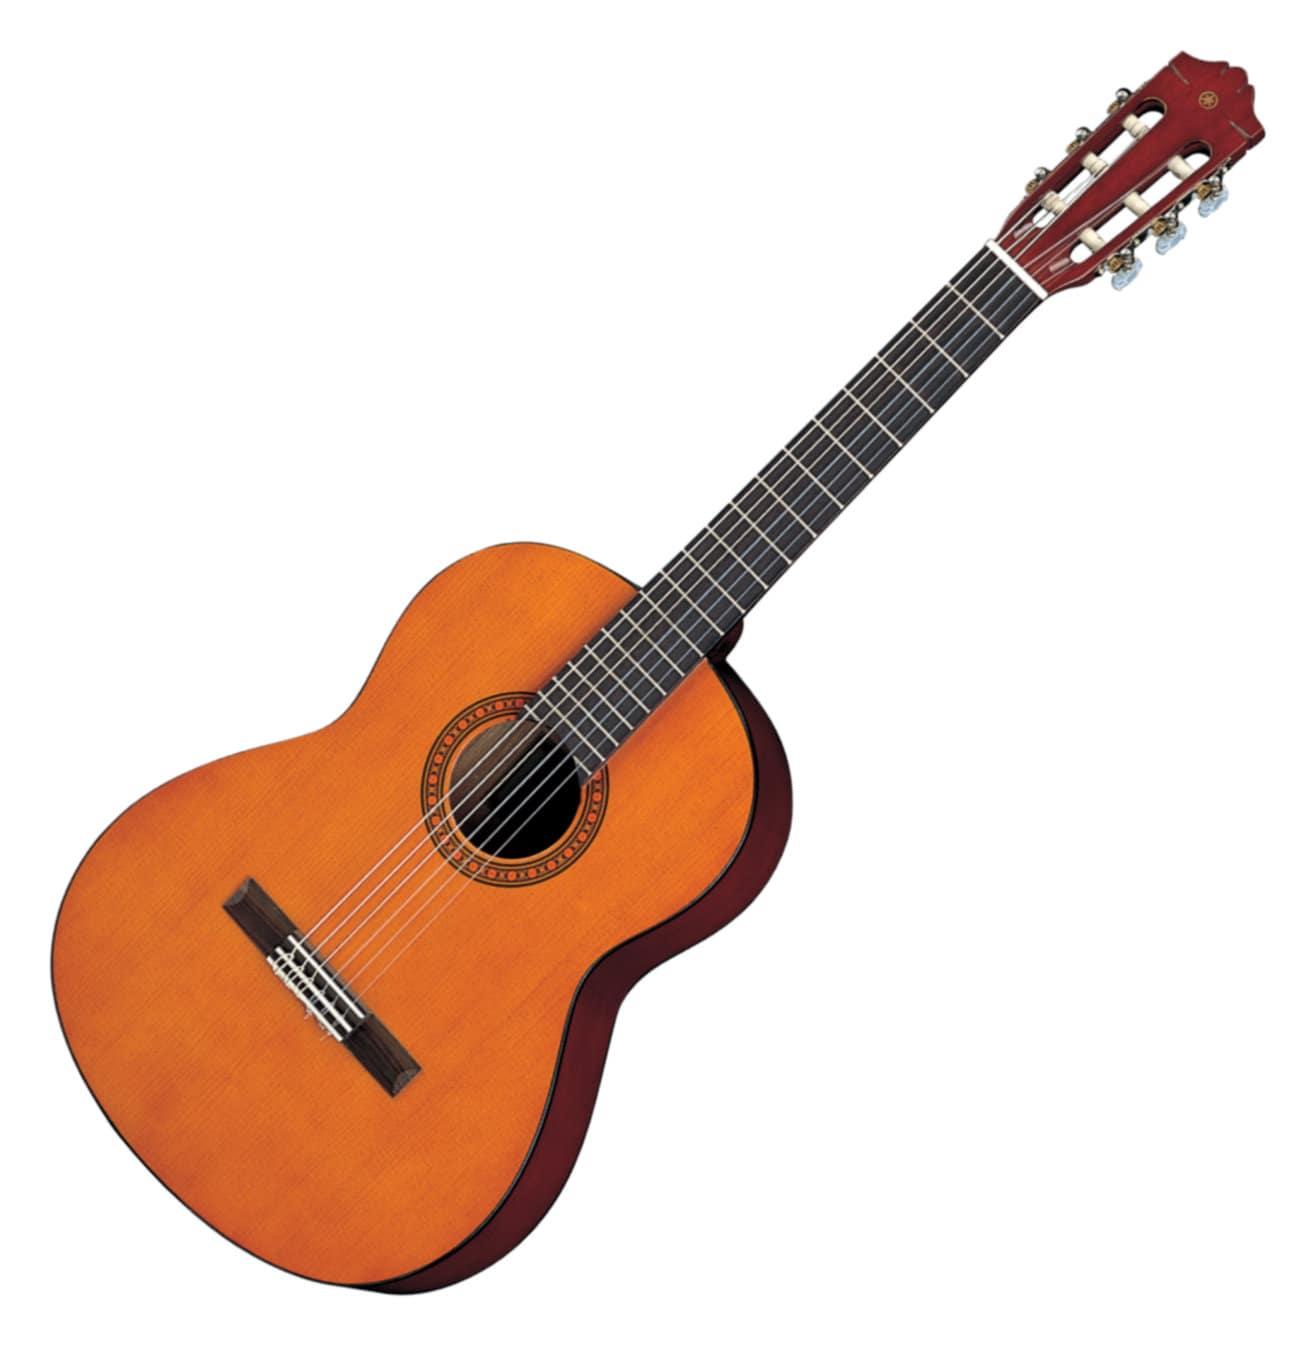 Yamaha CS40 Konzertgitarre (Fichte)